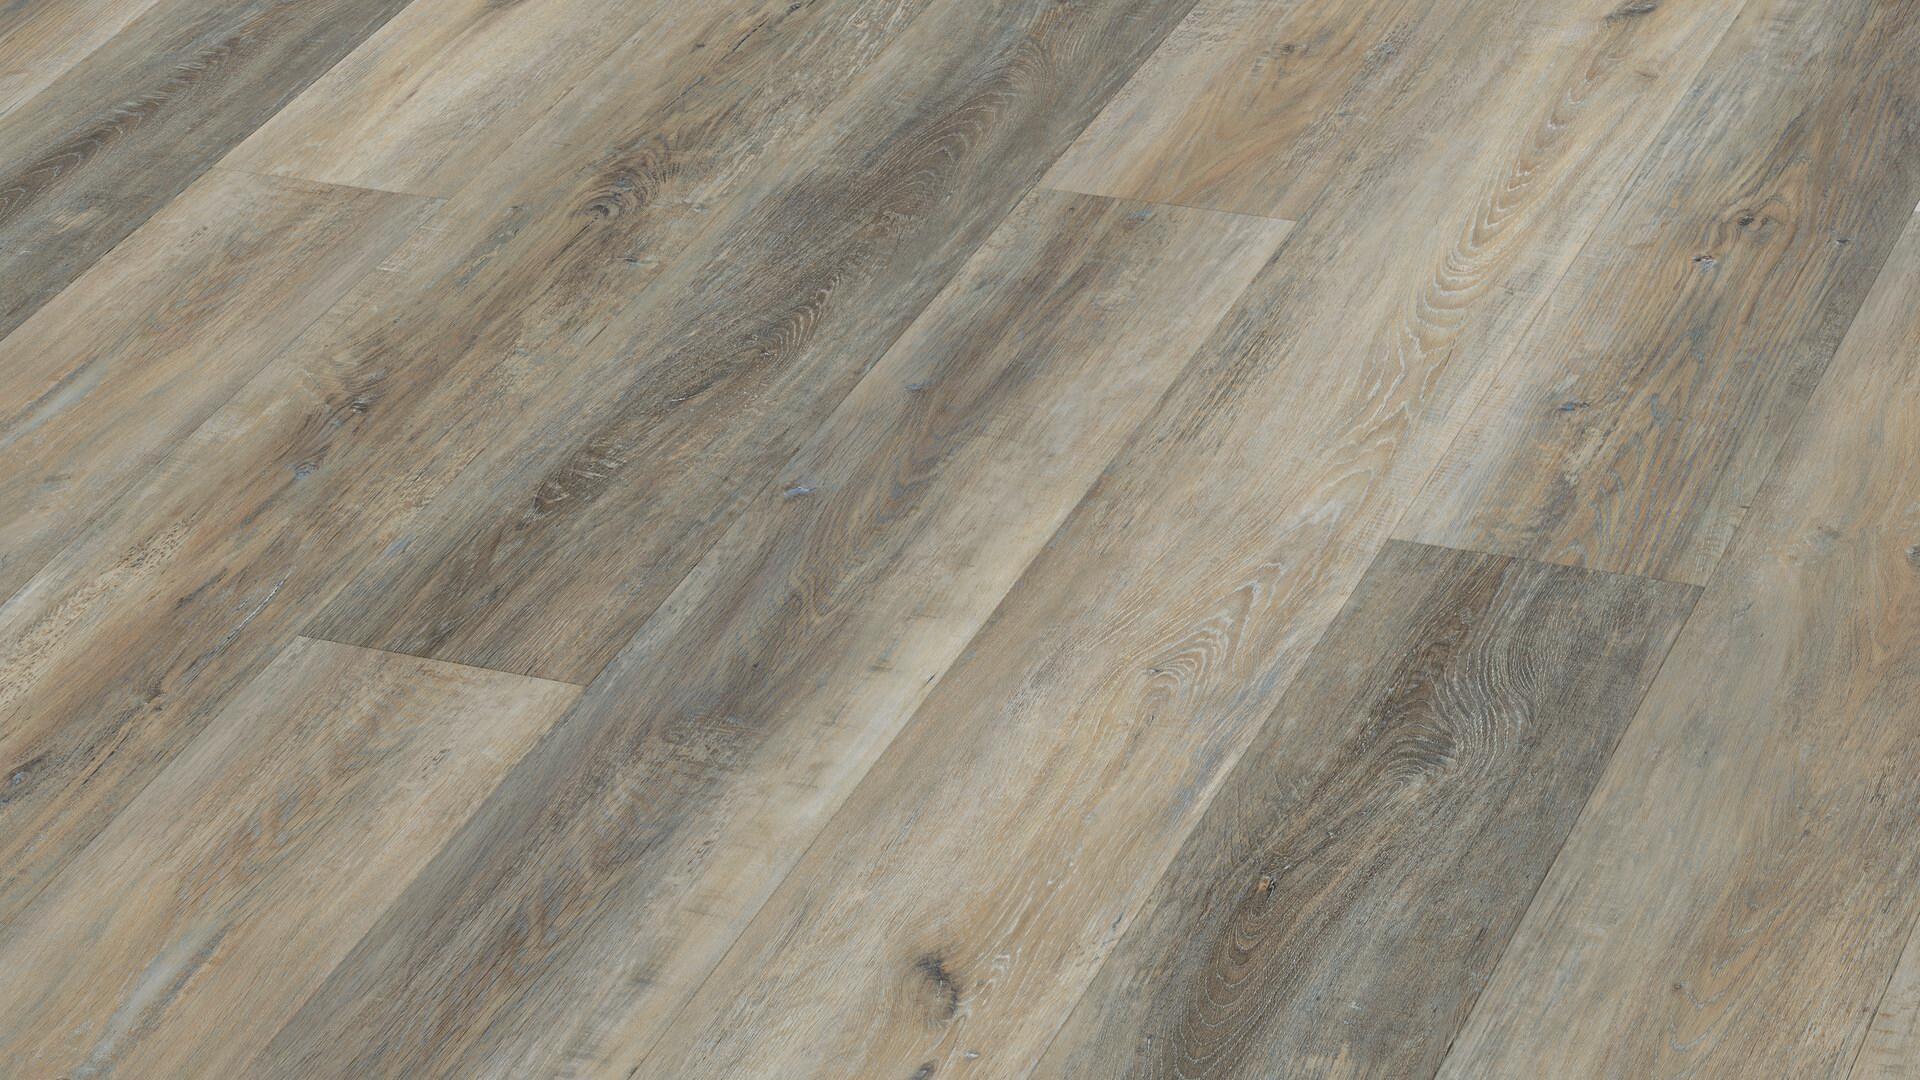 Design flooring MeisterDesign. rigid RL 400 S Prospector's discovery 7409